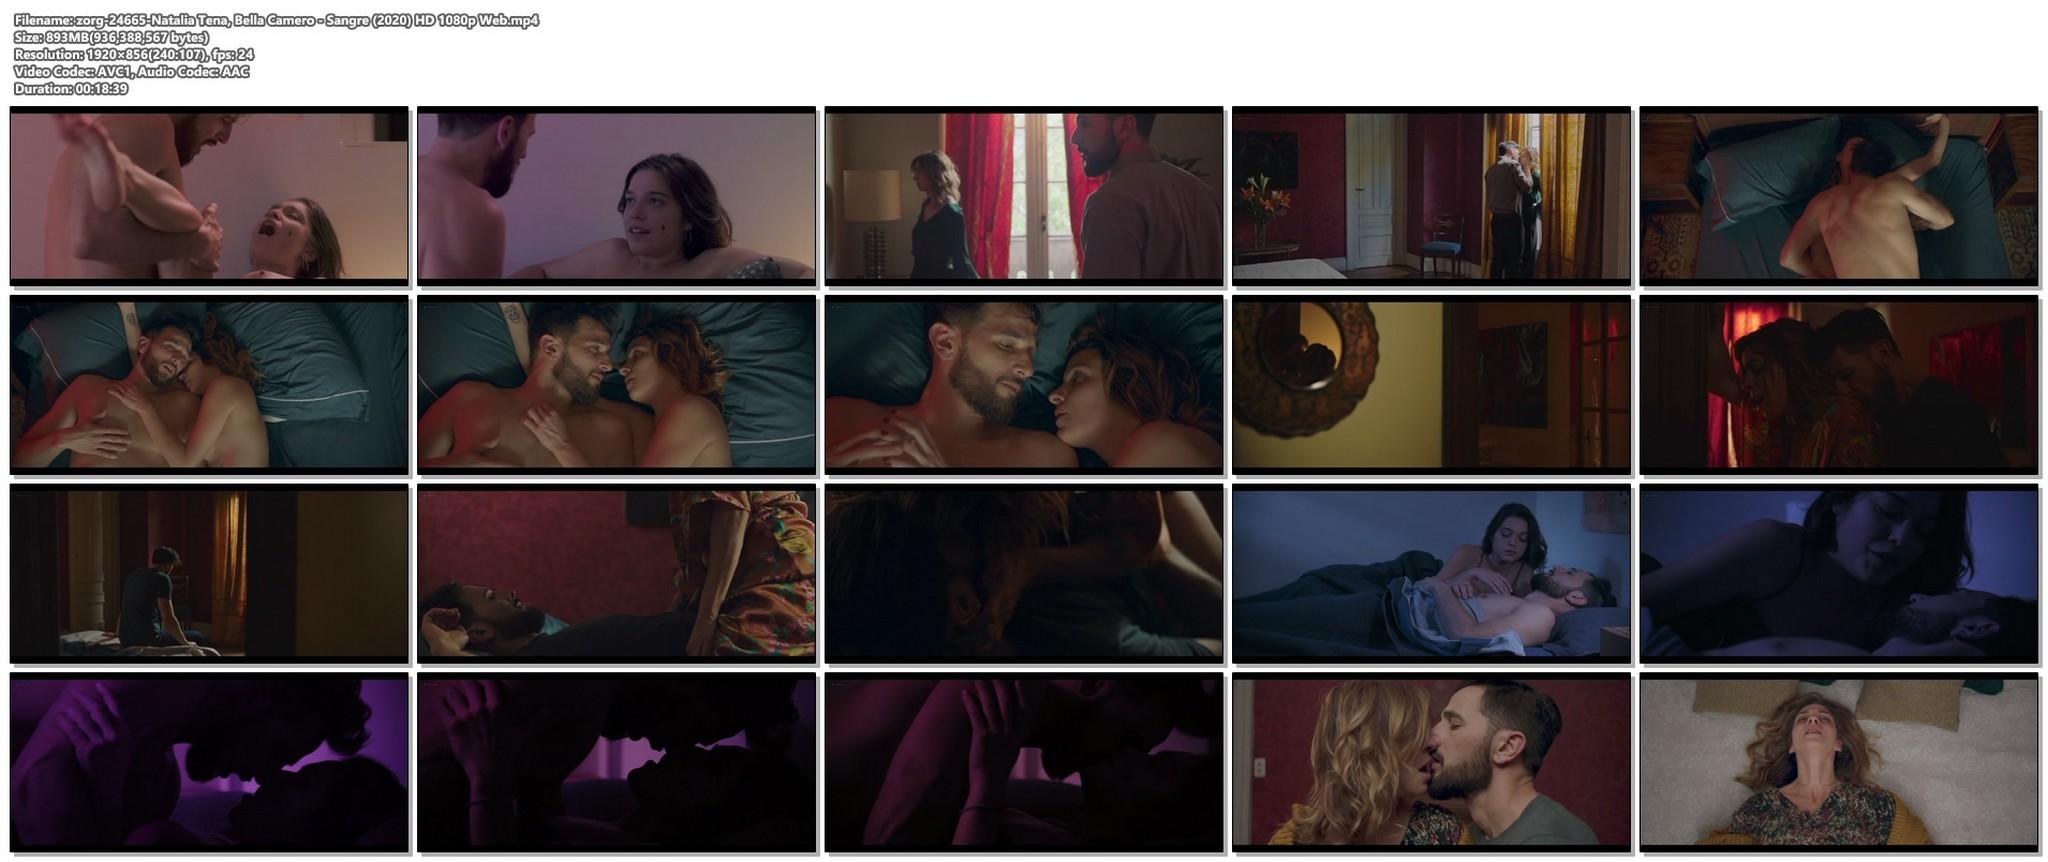 Natalia Tena nude sex Bella Camero nude and hot sex too Sangre 2020 HD 1080p Web 015